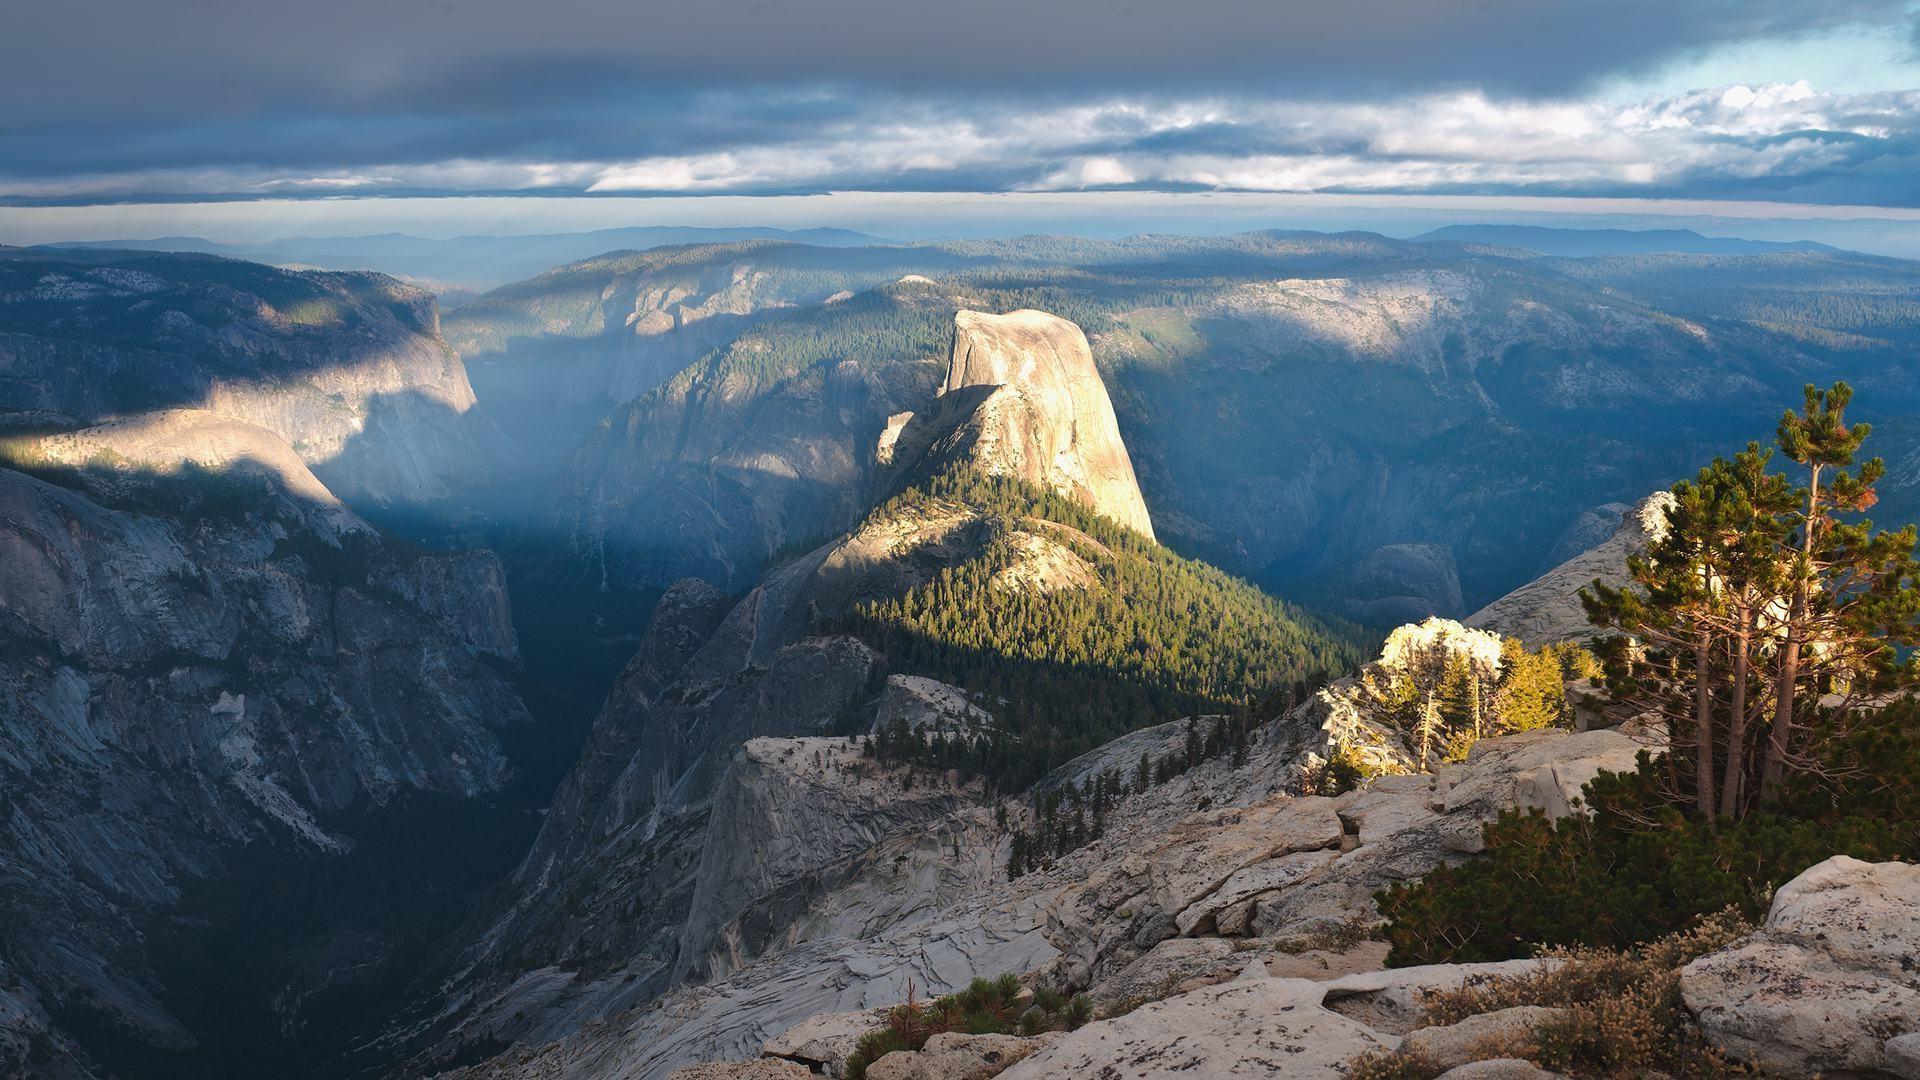 Wallpaper : landscape, rock, nature, sky, cliff, Yosemite